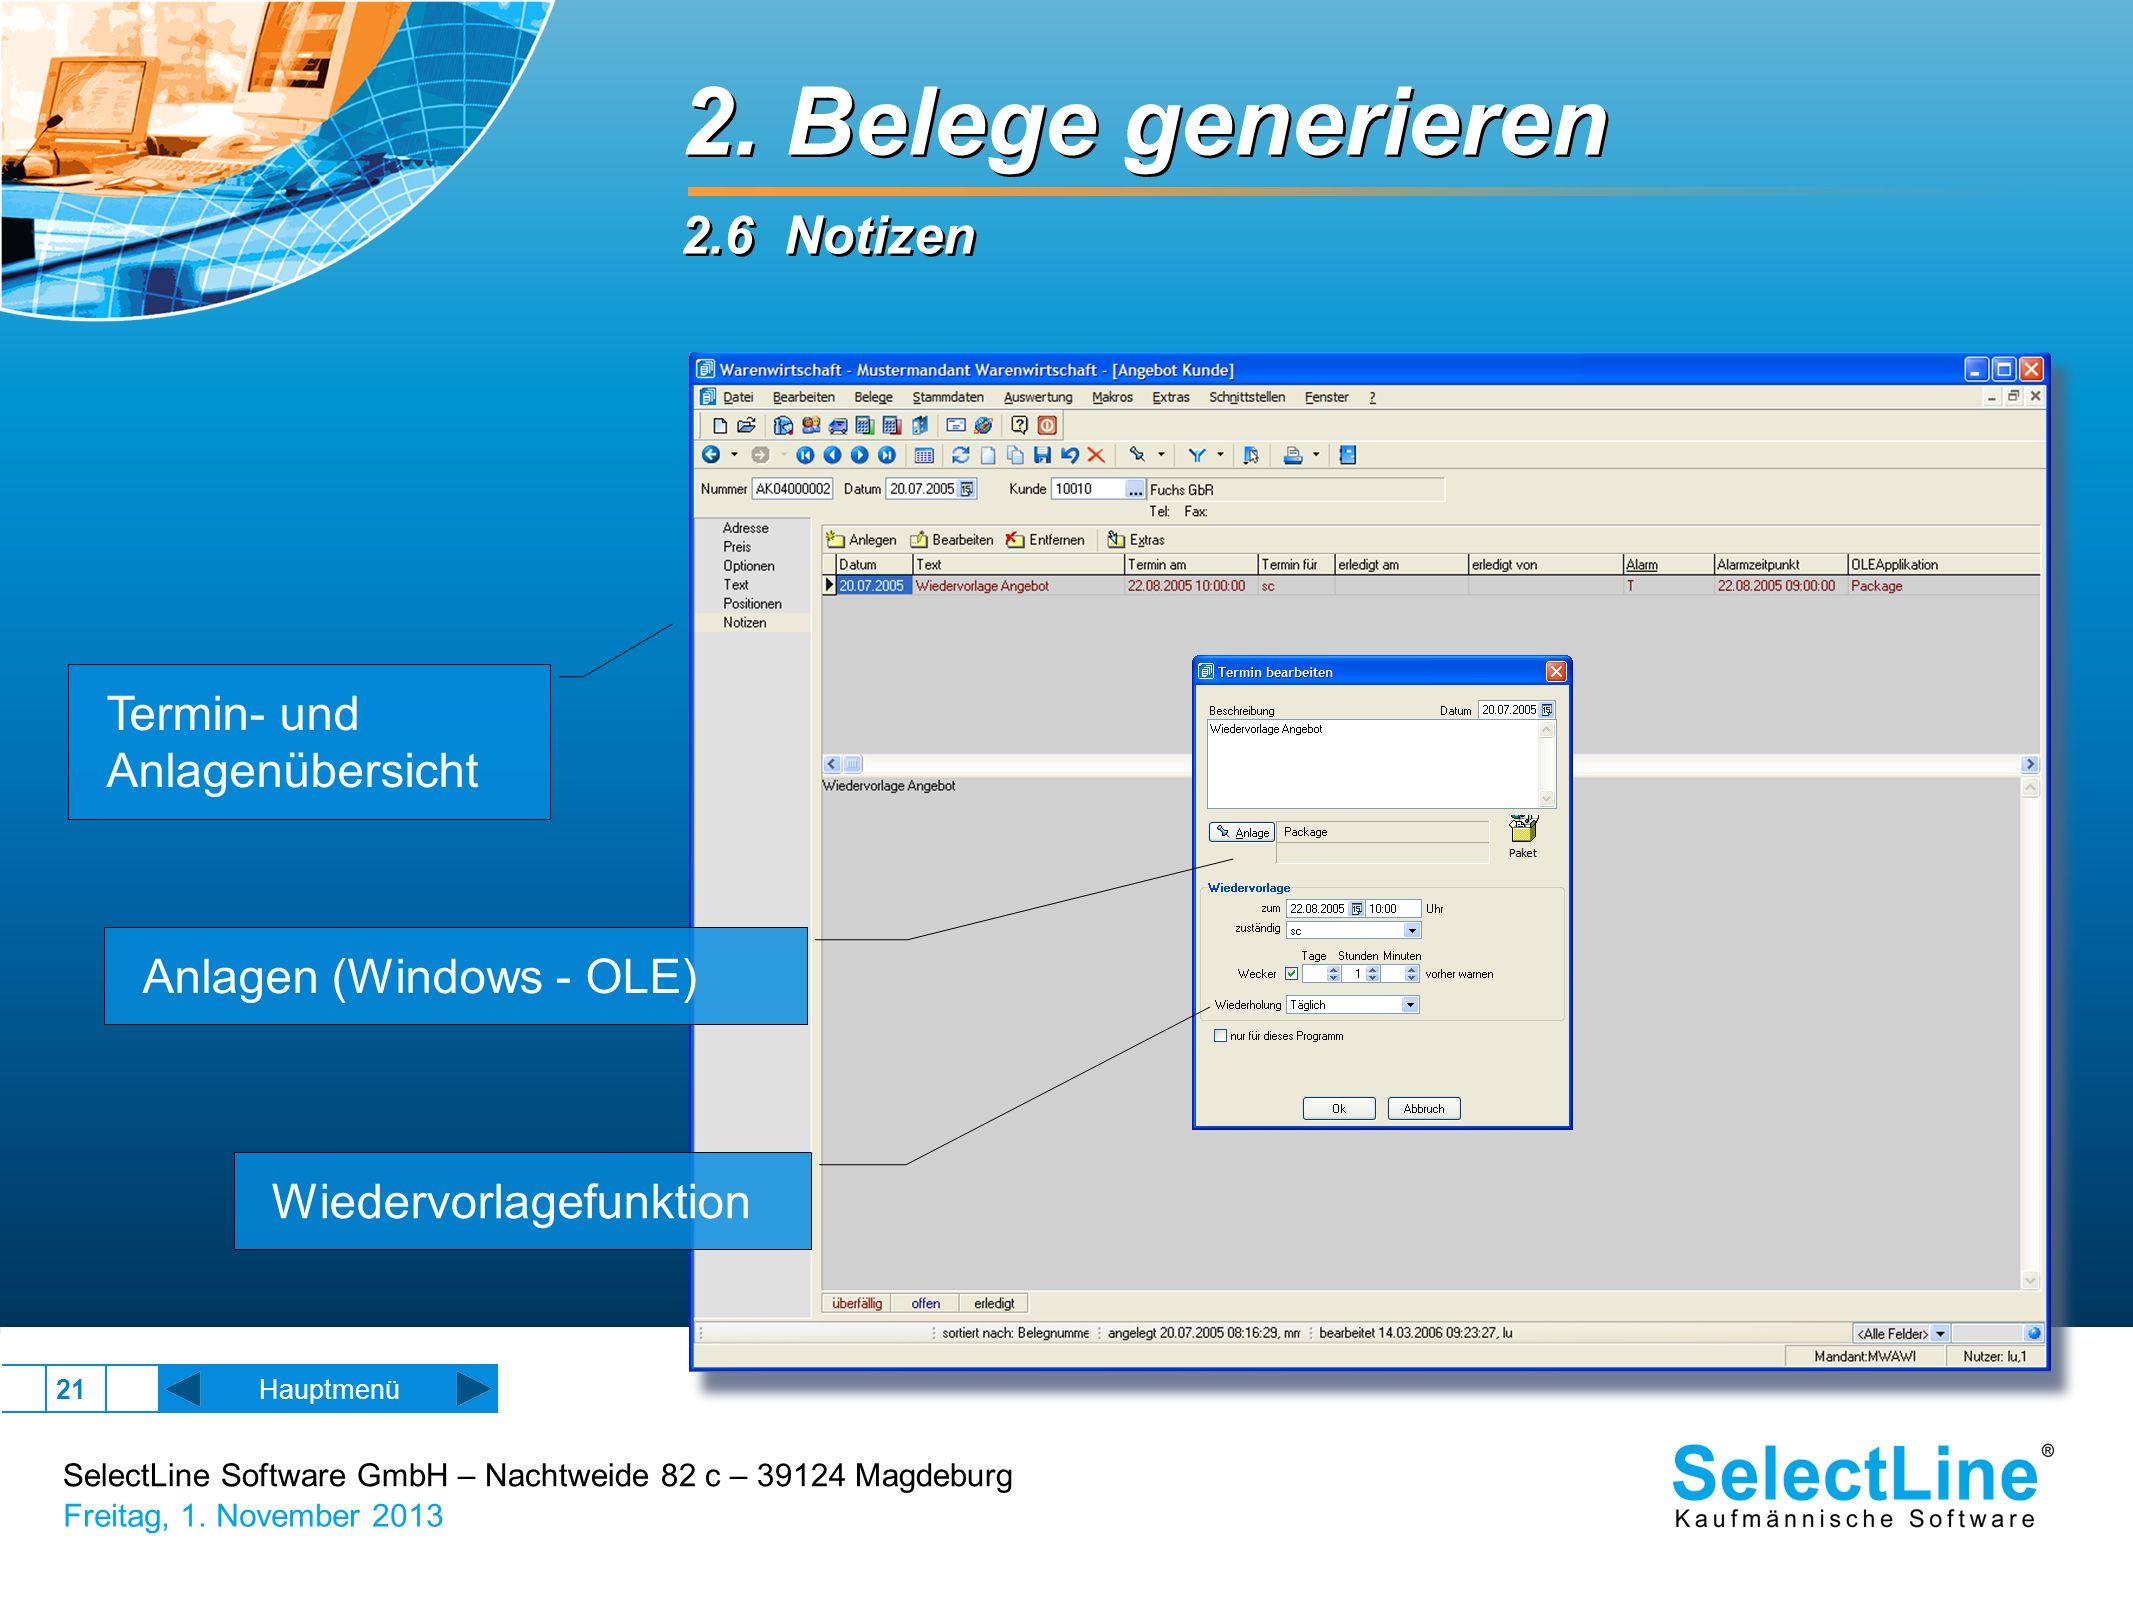 SelectLine Software GmbH – Nachtweide 82 c – 39124 Magdeburg Freitag, 1. November 2013 21 2. Belege generieren 2.6 Notizen 2. Belege generieren 2.6 No